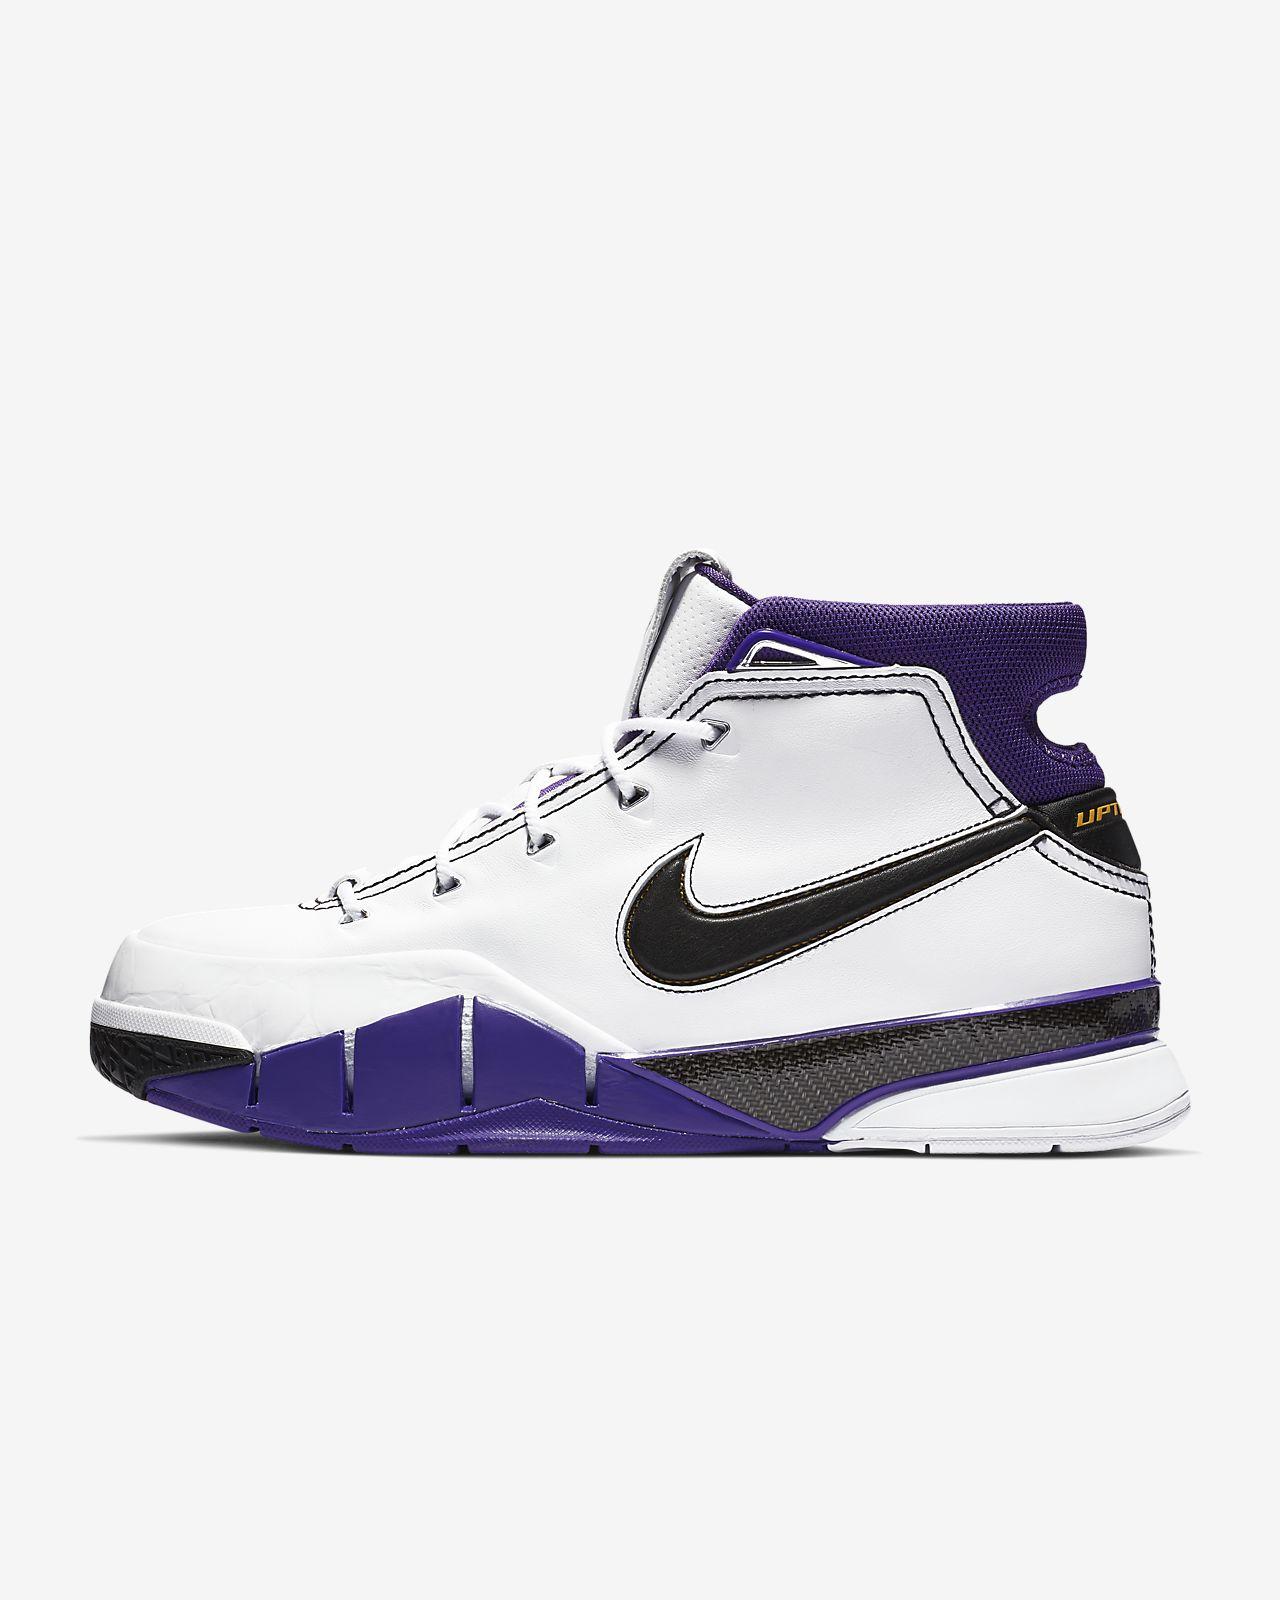 Calzado de básquetbol Kobe 1 Protro